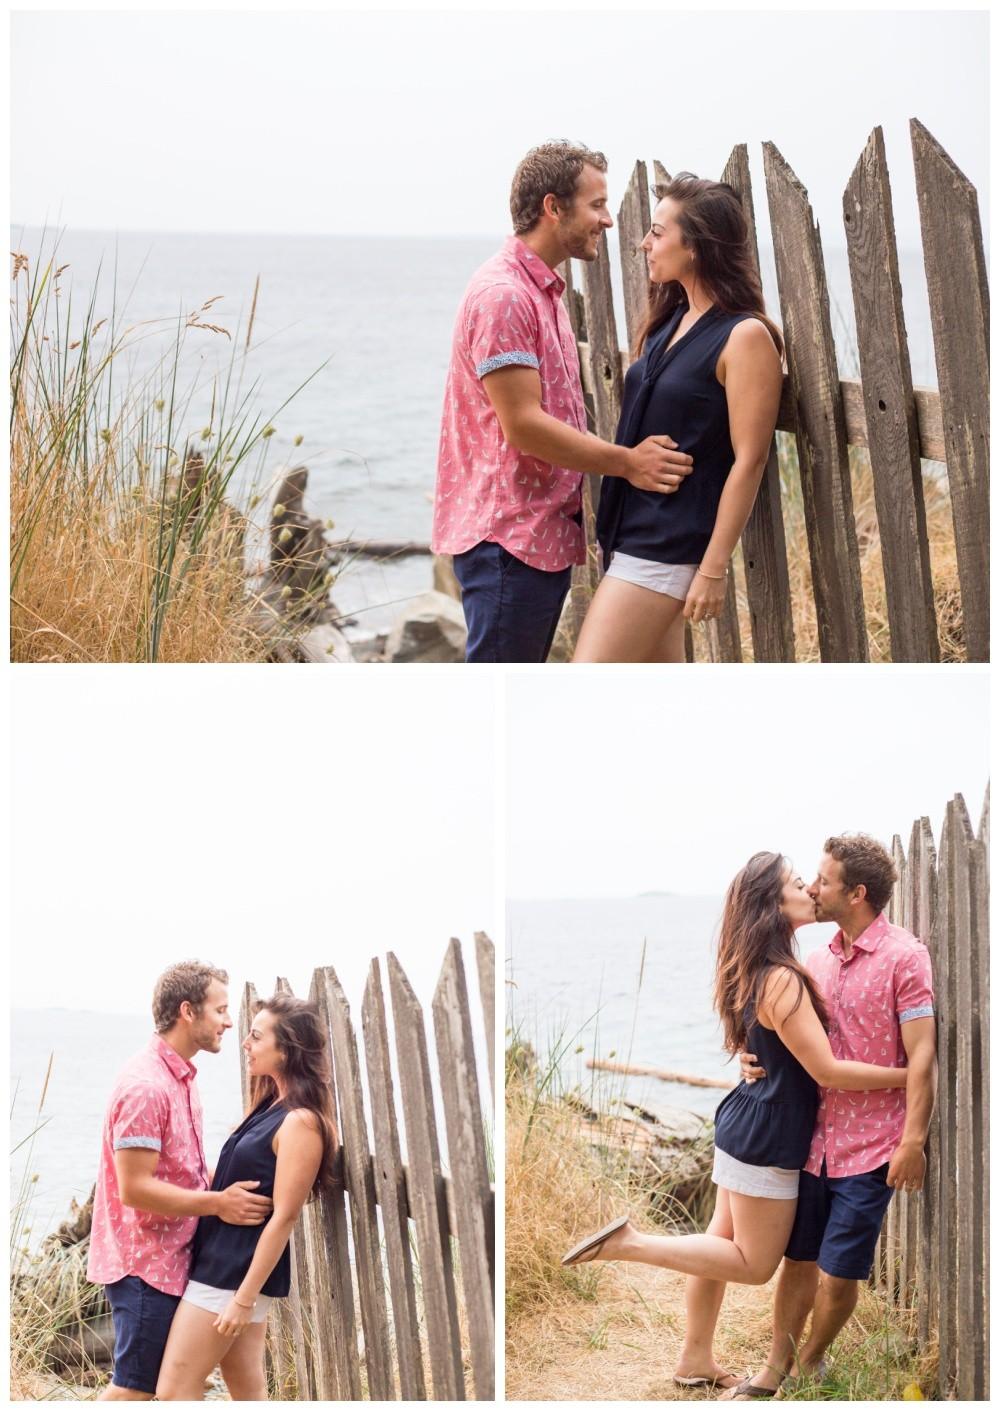 Nanaimo Engagement Photo Locations